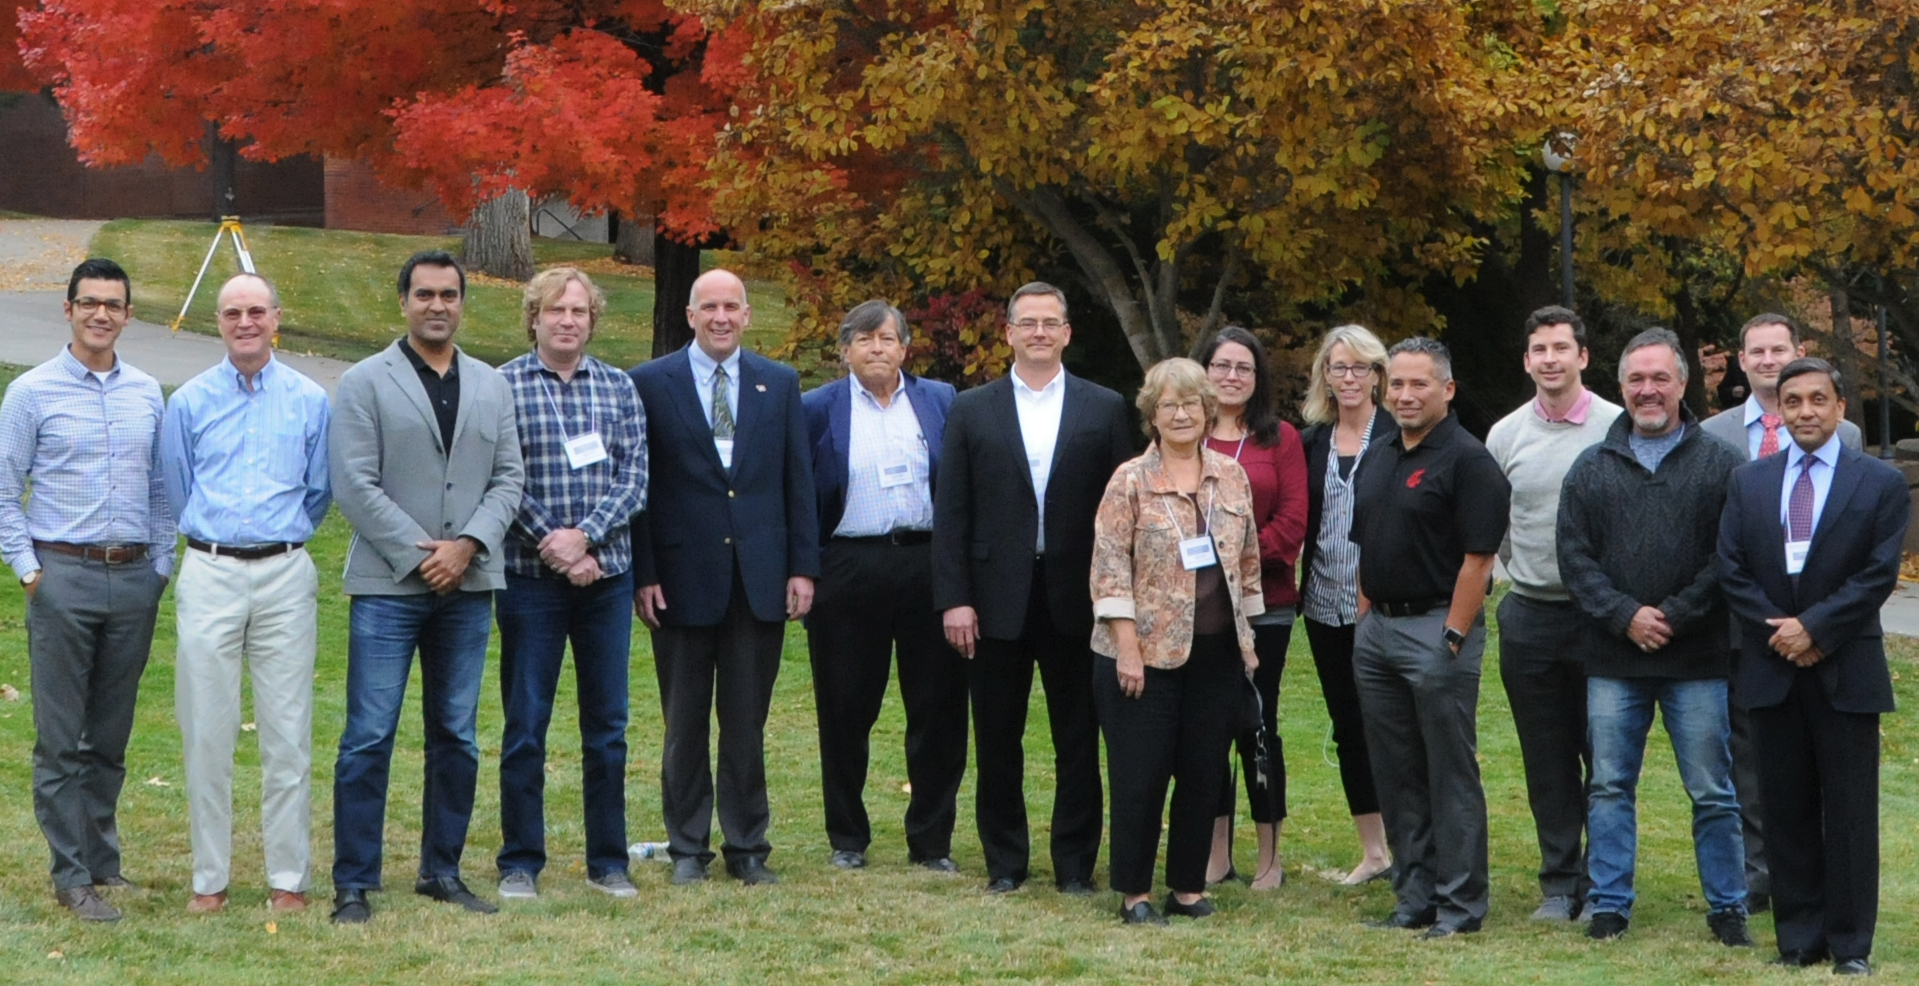 Group photo of fall 2018 advisory board